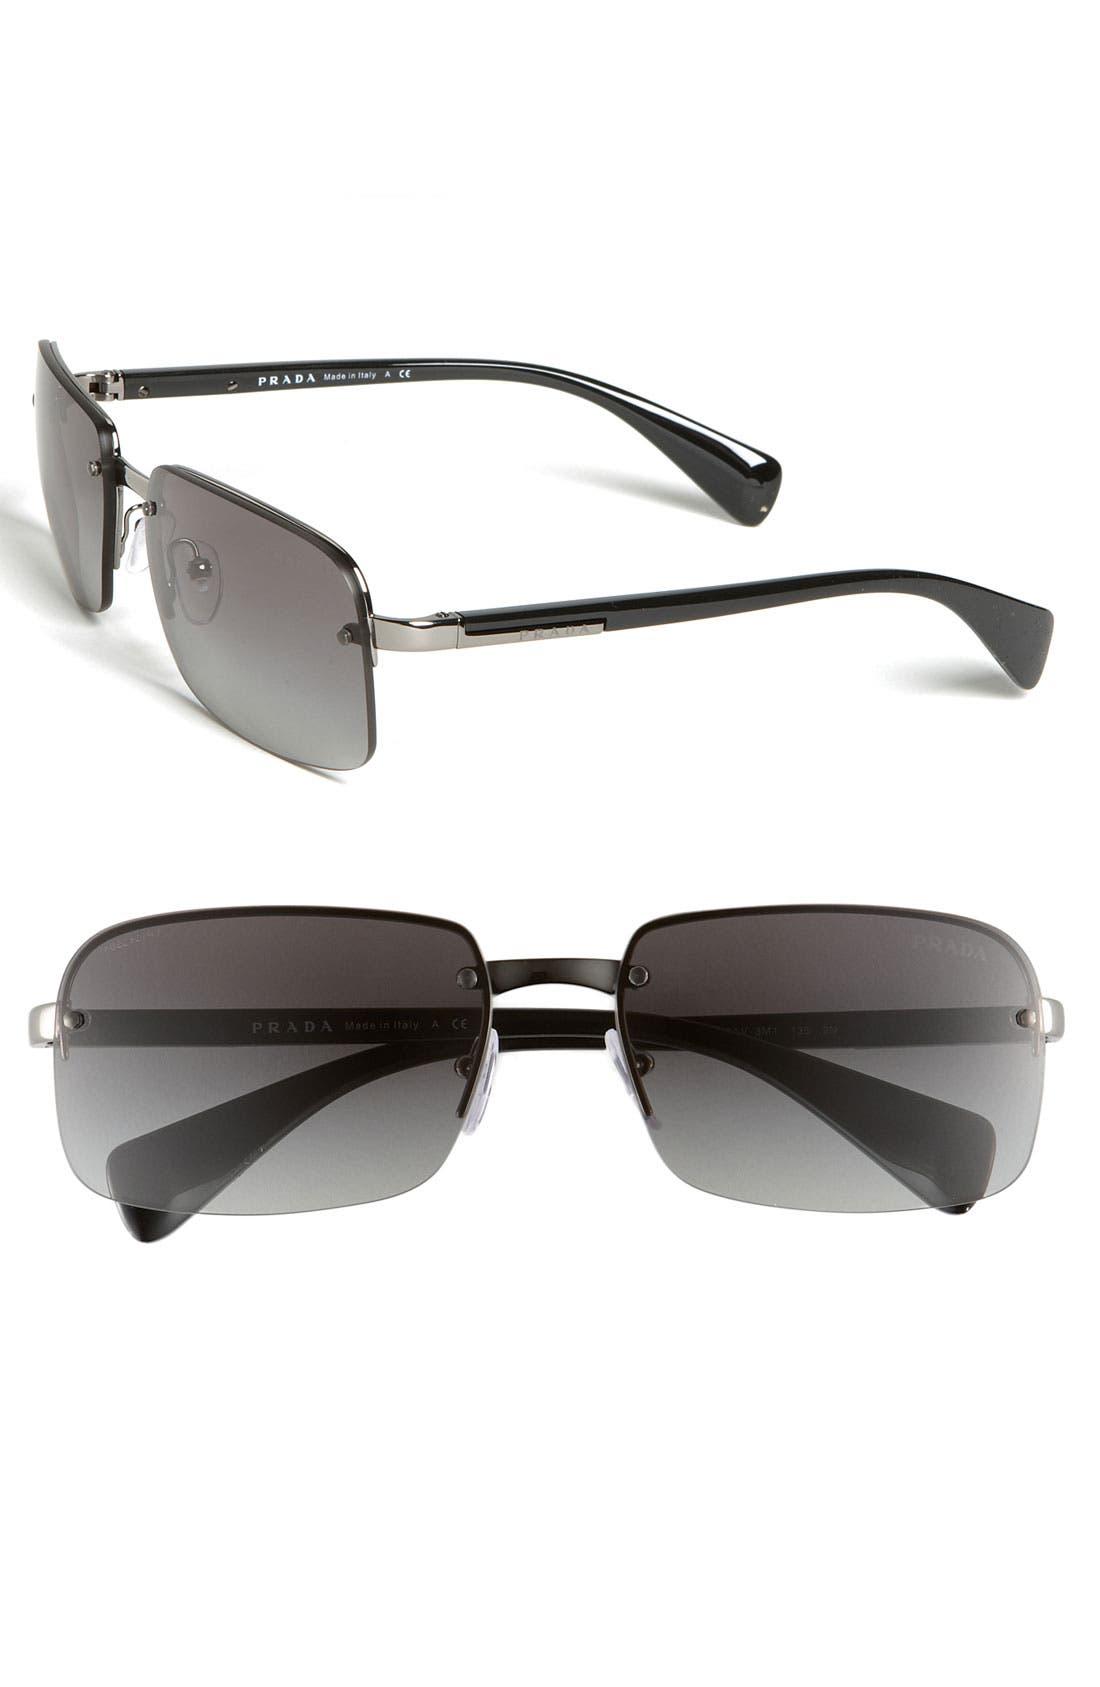 Main Image - Prada 60mm Rimless Sunglasses